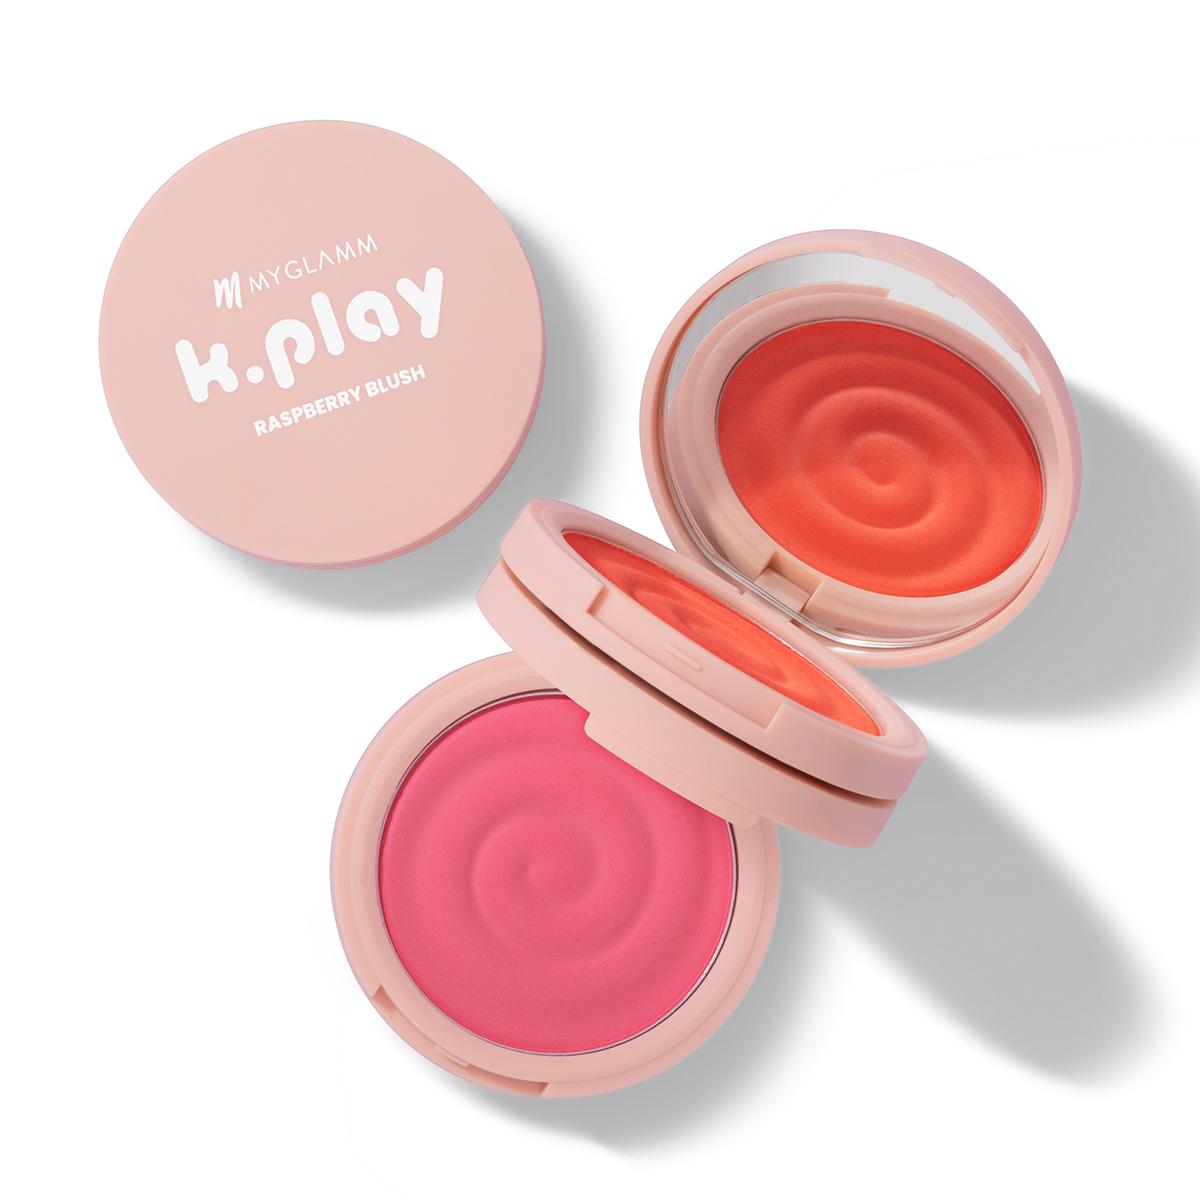 kplay-flavoured-blush